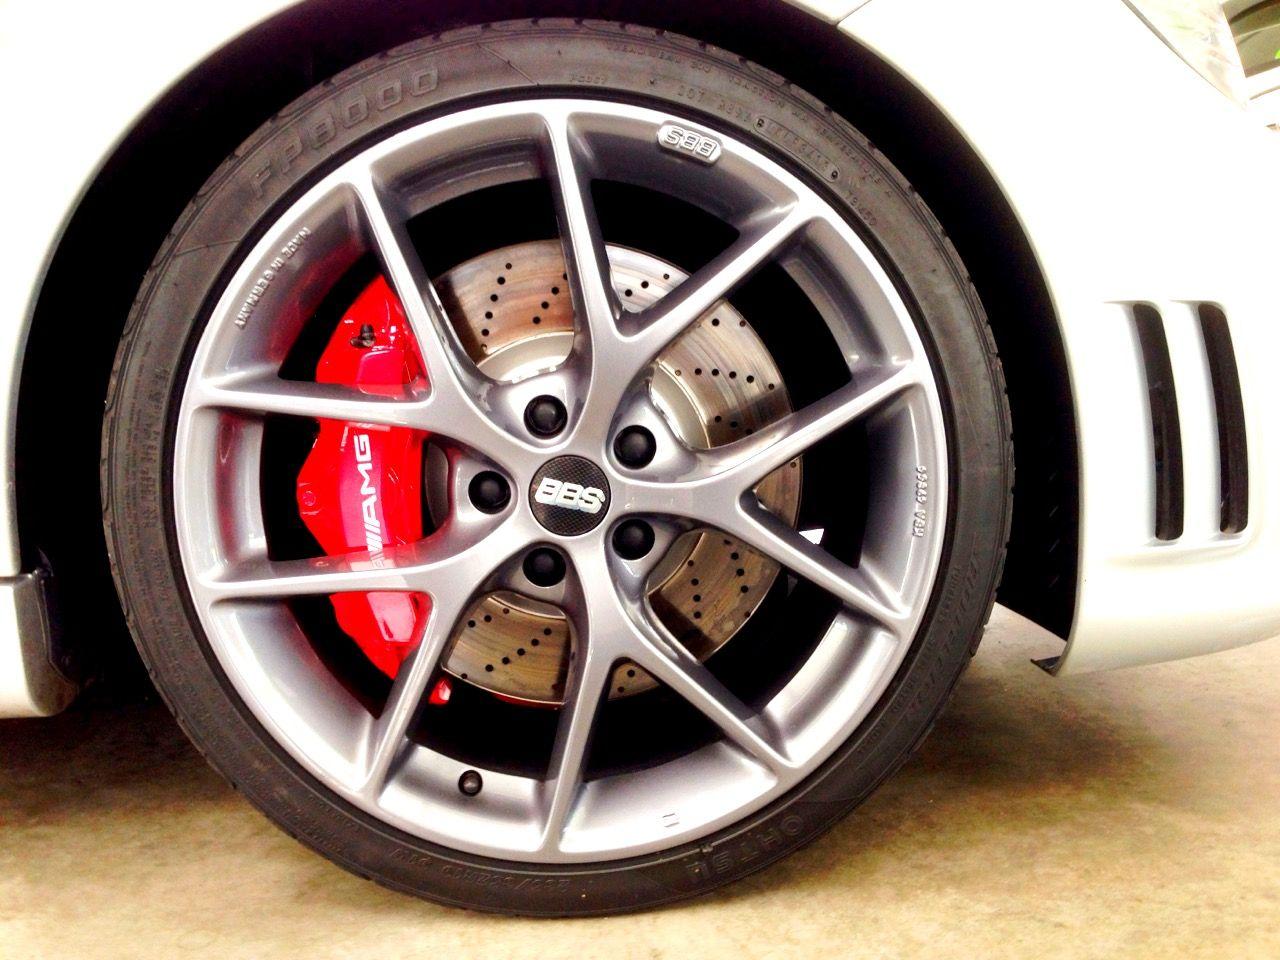 bbs wheel 18 mercedes amg c63 wheels rines. Black Bedroom Furniture Sets. Home Design Ideas